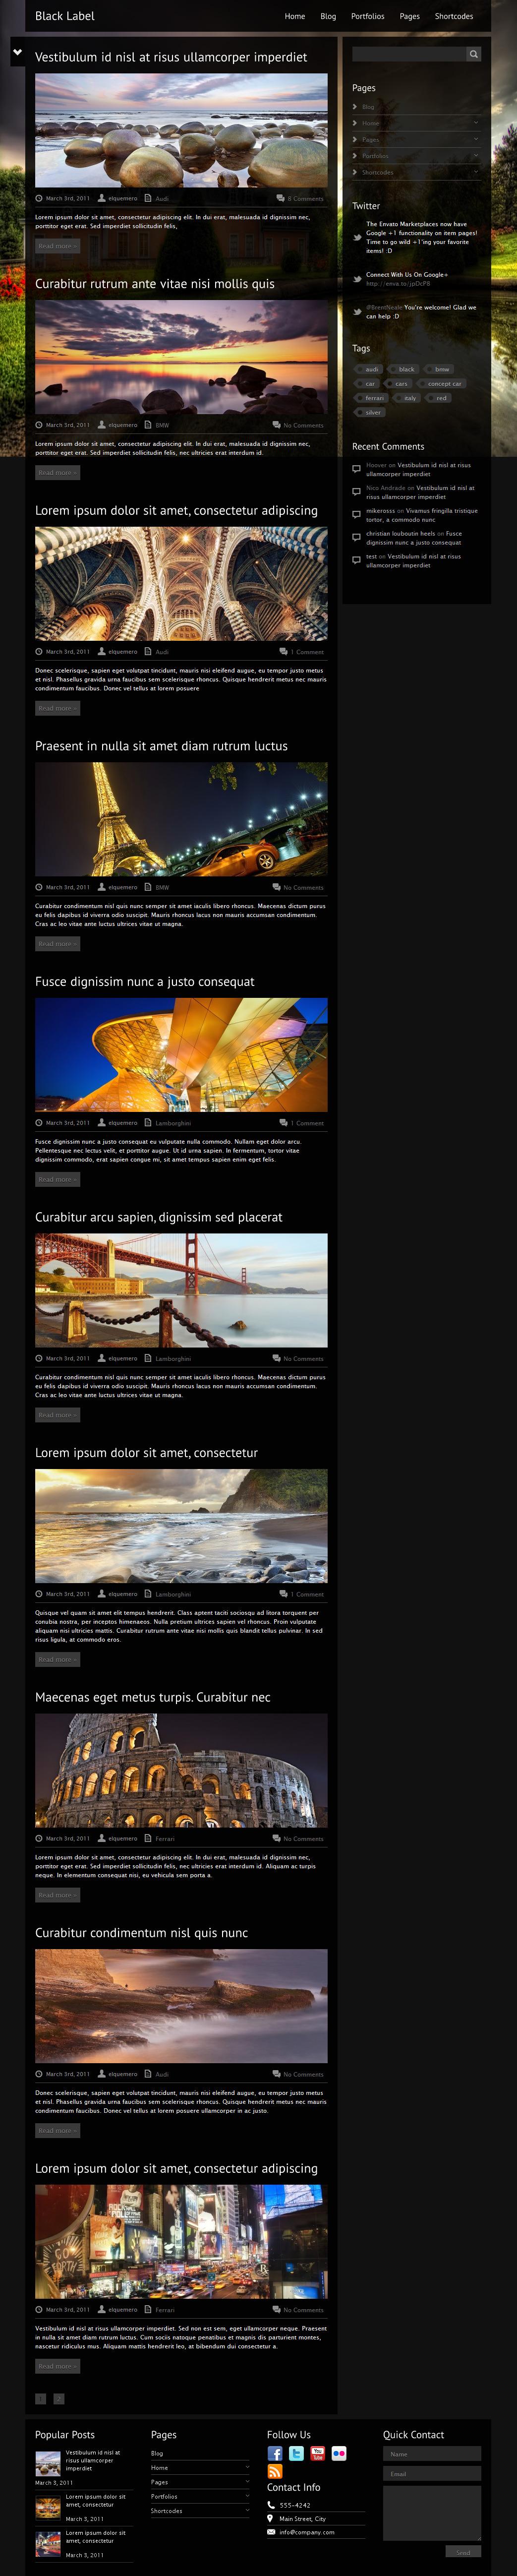 Black Label - Fullscreen Video & Image Background - Portfolio Unlimited Color Elements, 30+ Shortcodes, Amazing Shortcode Generator, Portfolio and Slider Custom Post Types, AJAX Contact Form, Video Documentation, Sidebar Generator